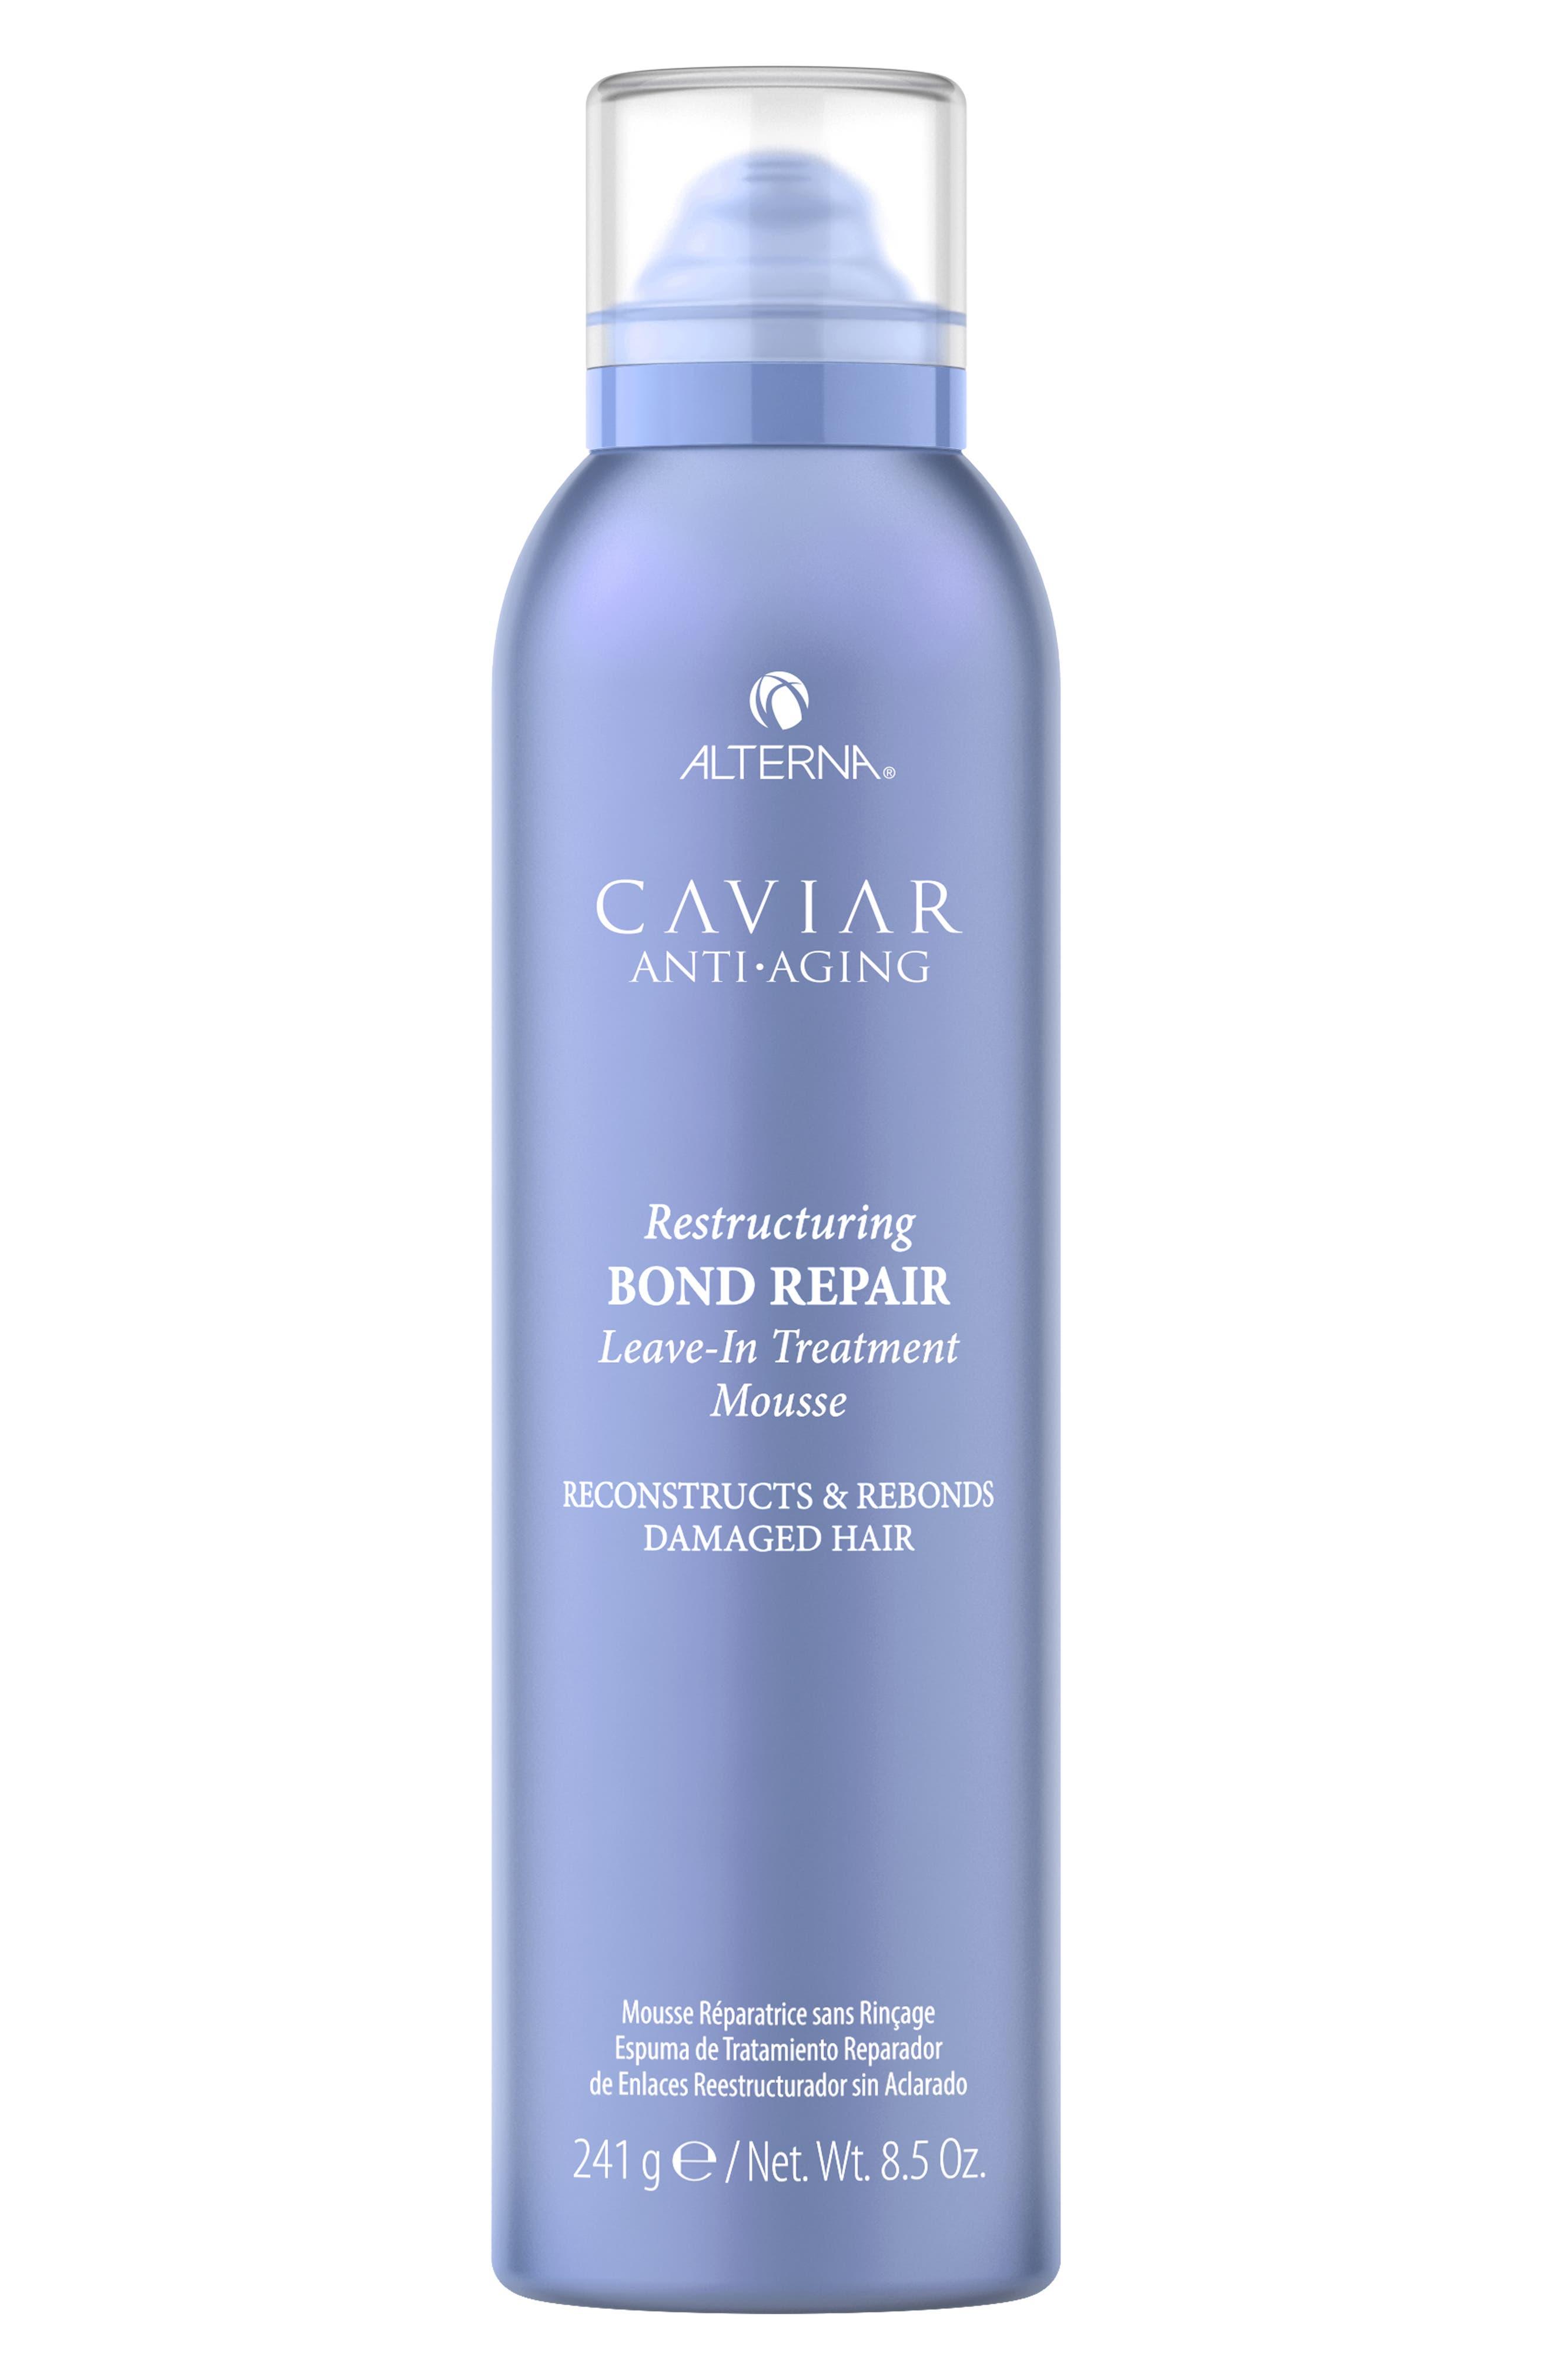 Alterna Caviar Anti-Aging Restructuring Bond Repair Leave-In Treatment Mousse